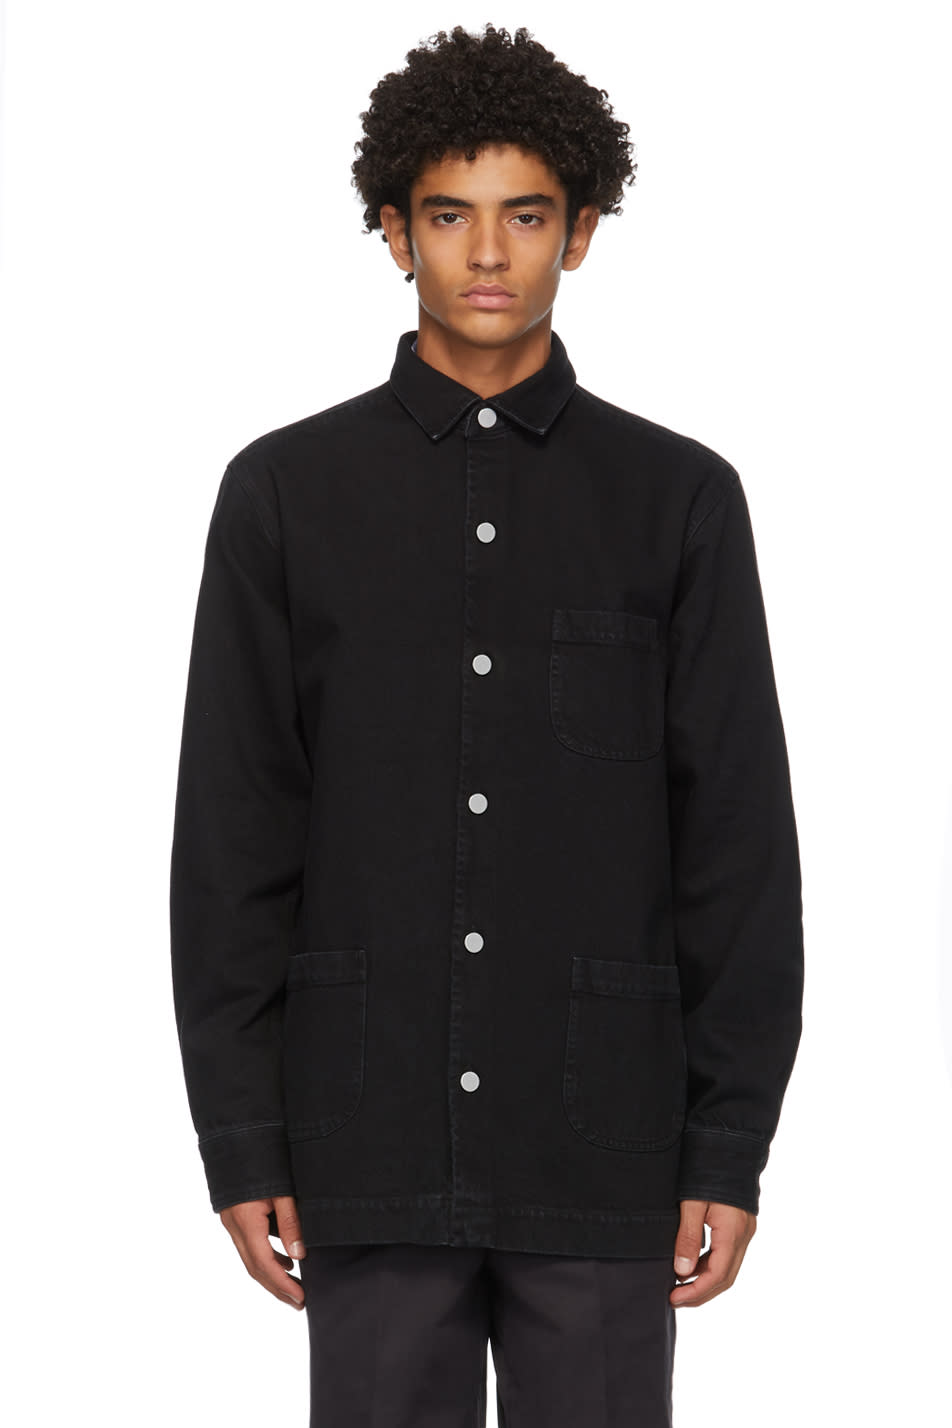 Schnayderman's 黑色 Denim One 夹克衬衫